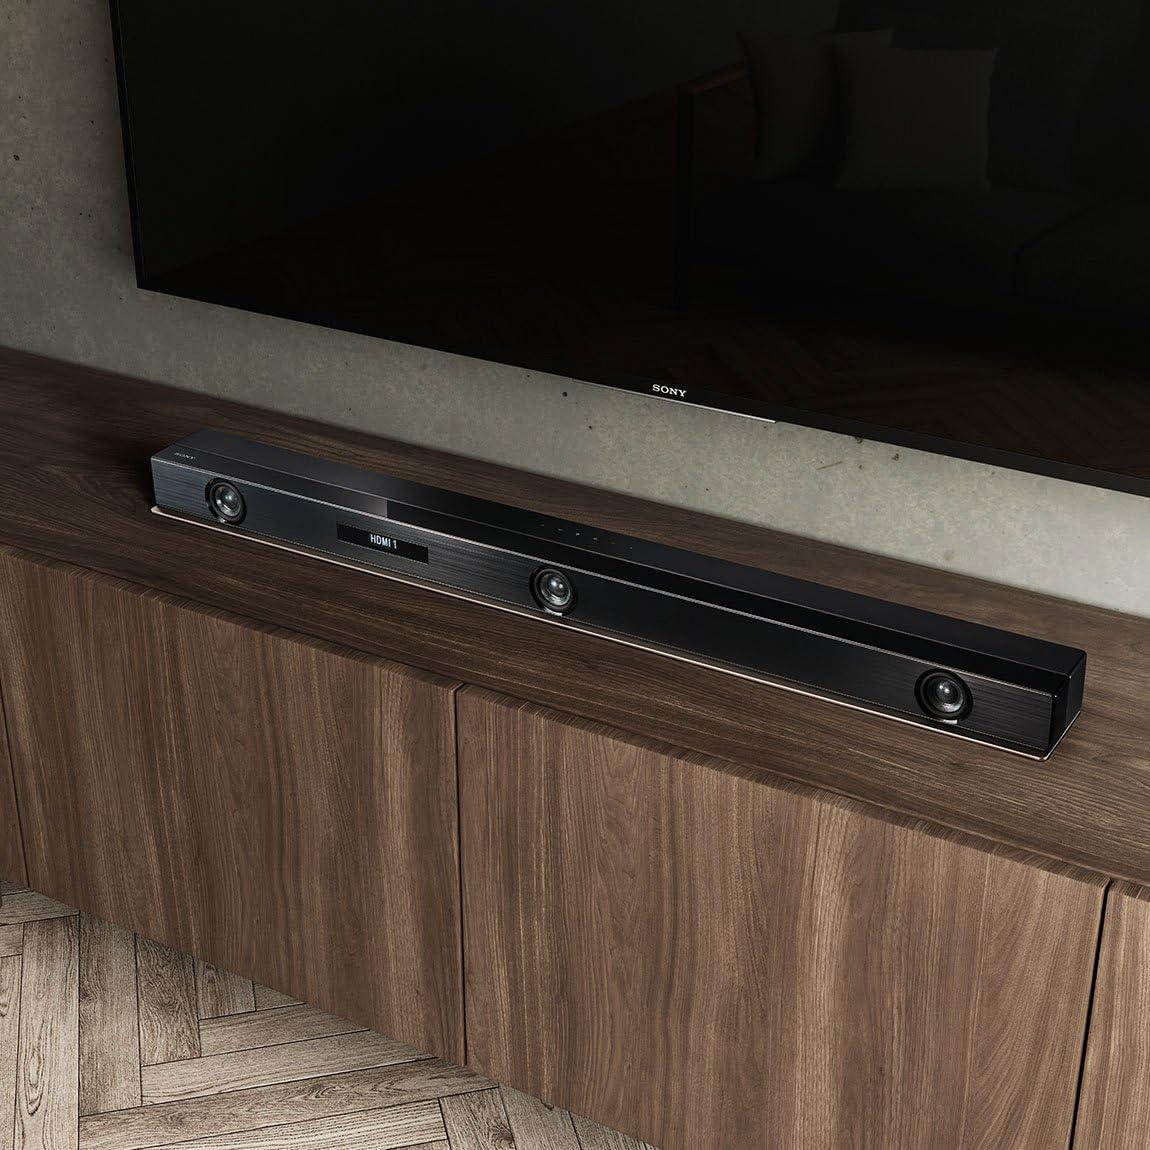 SONY、サウンドバー、HT-Z9F、Dolby Atmos対応